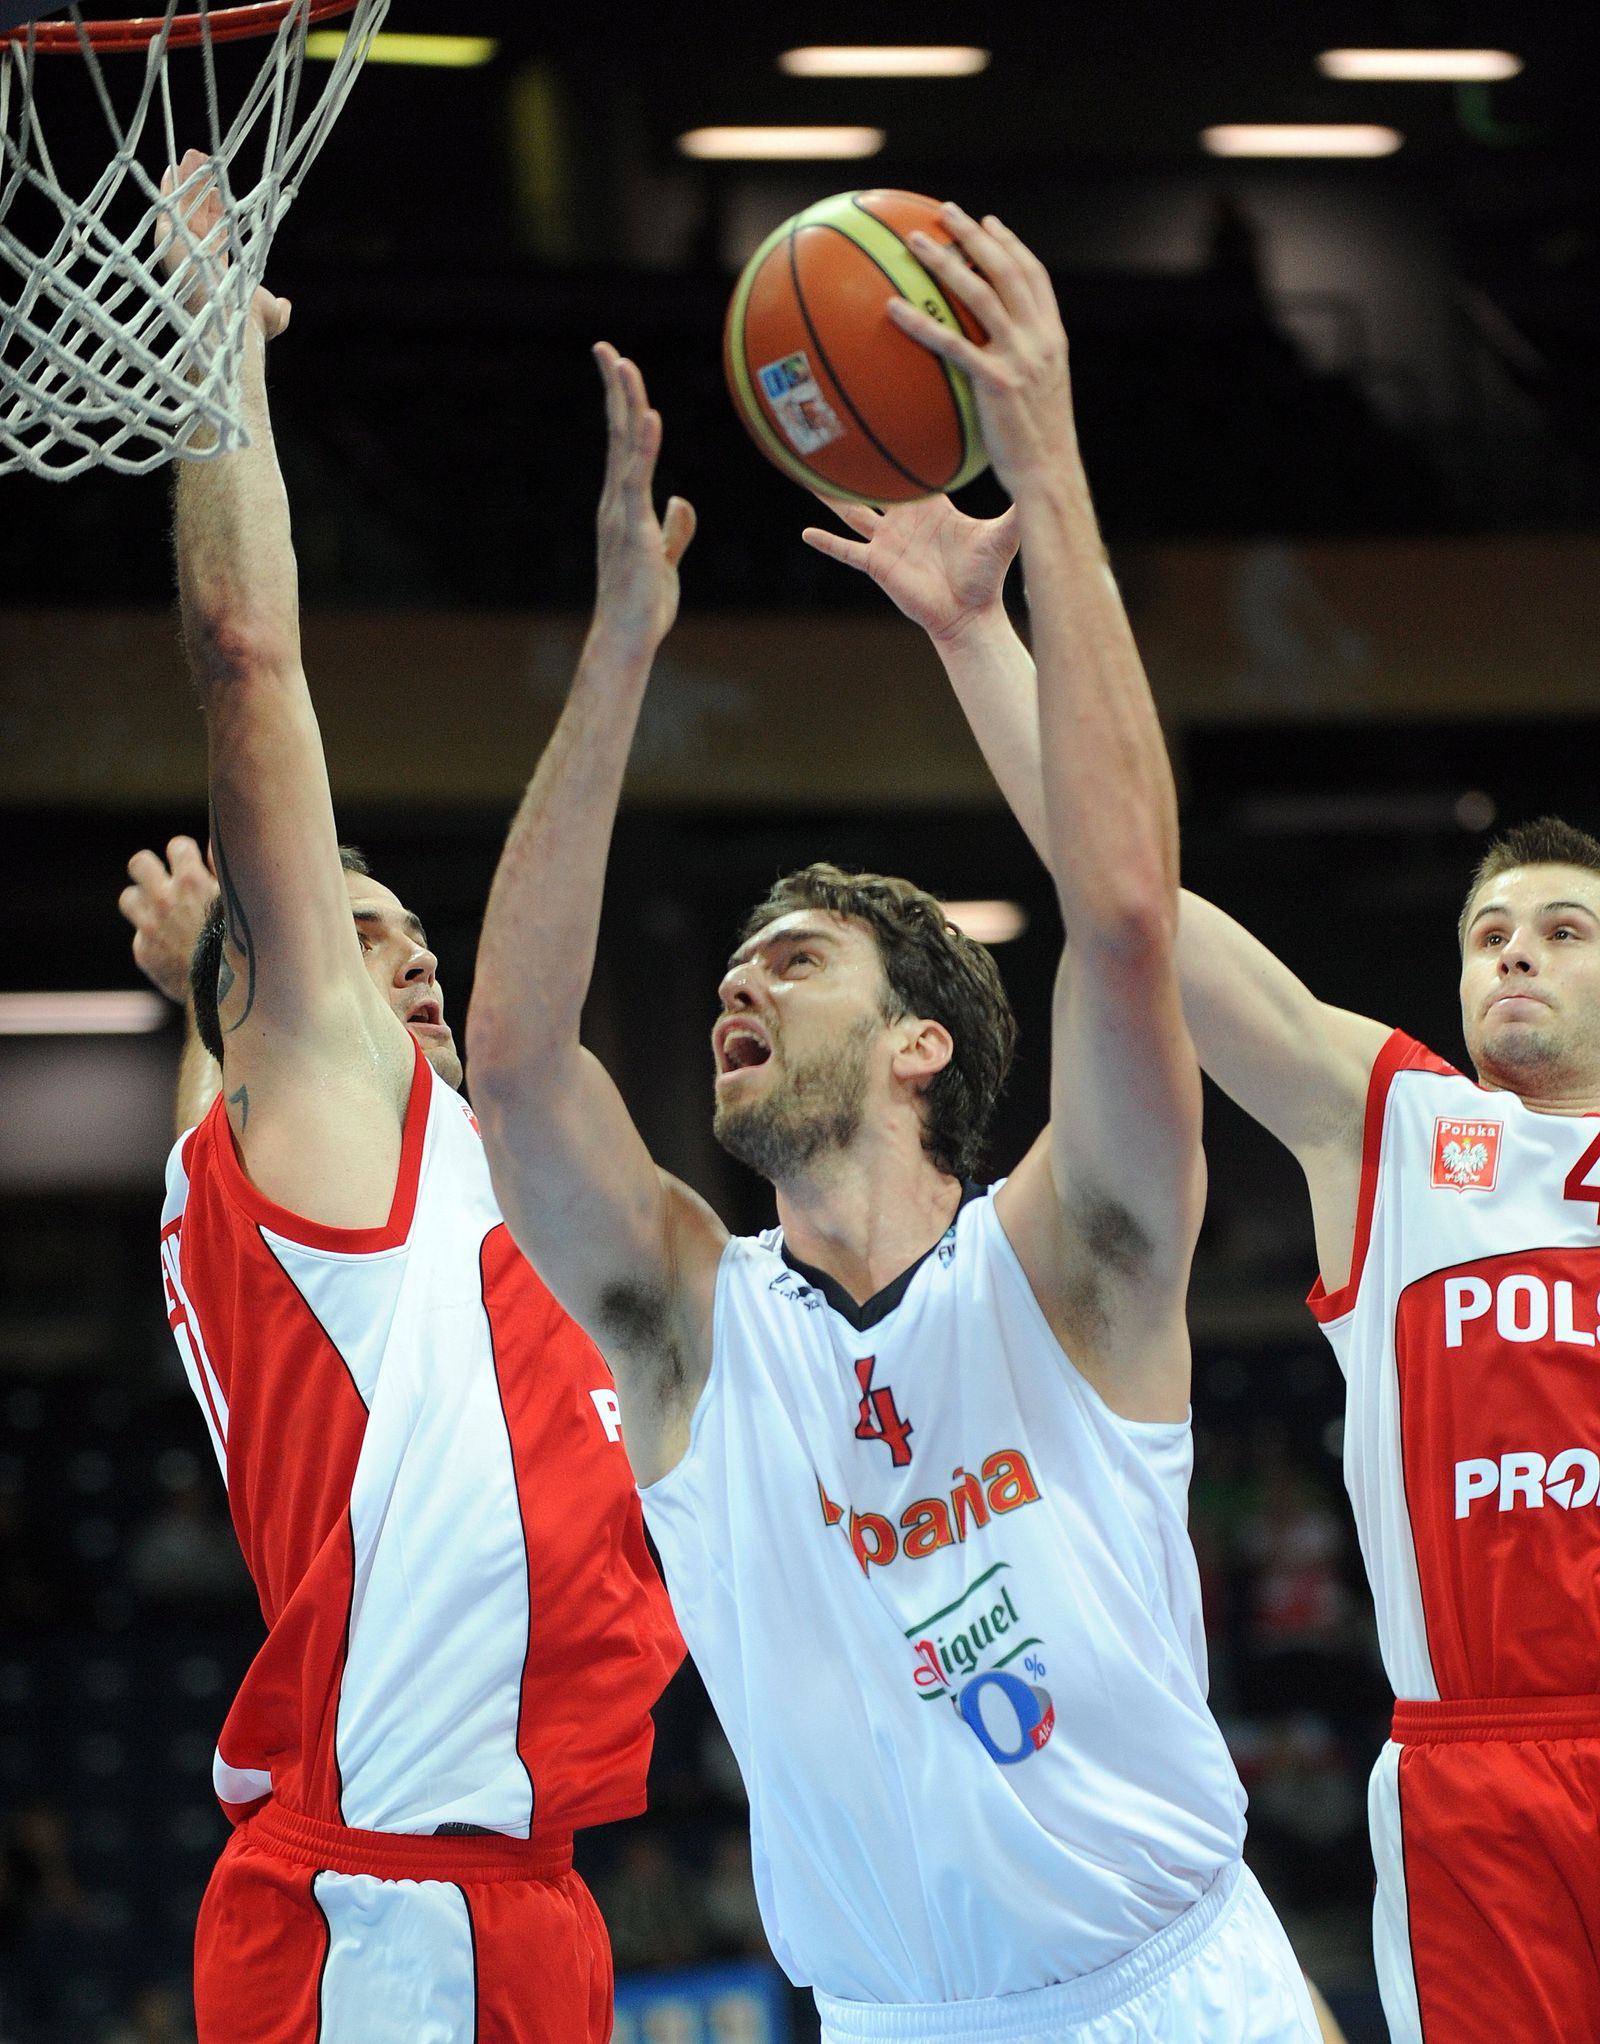 Spain vs Poland